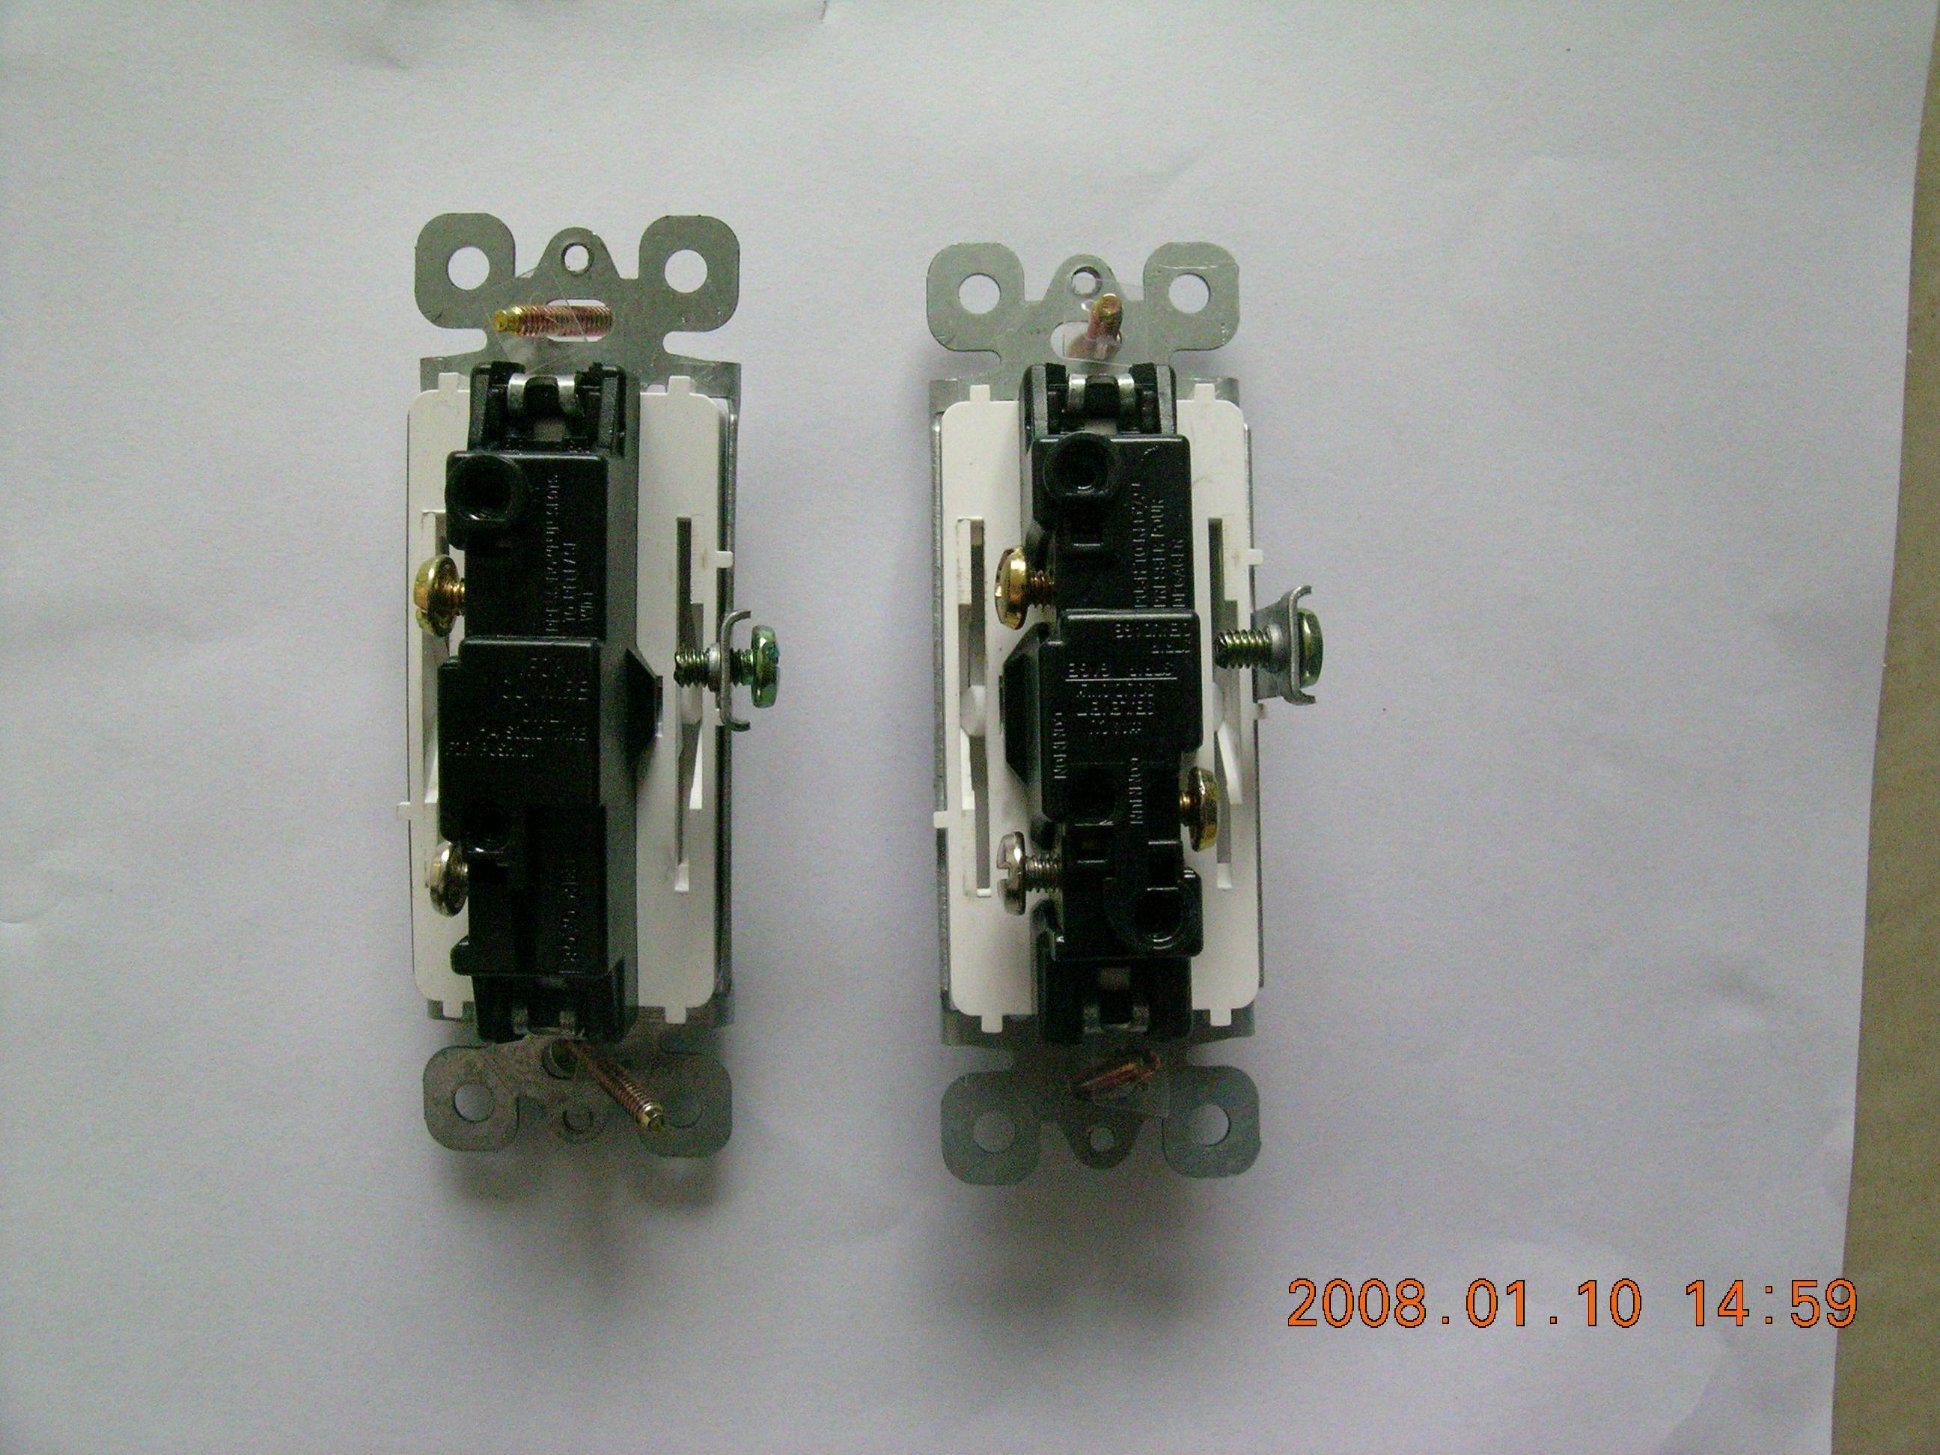 15A 120/277V Decora Rocker UL/cUL Switch, Residential Grade